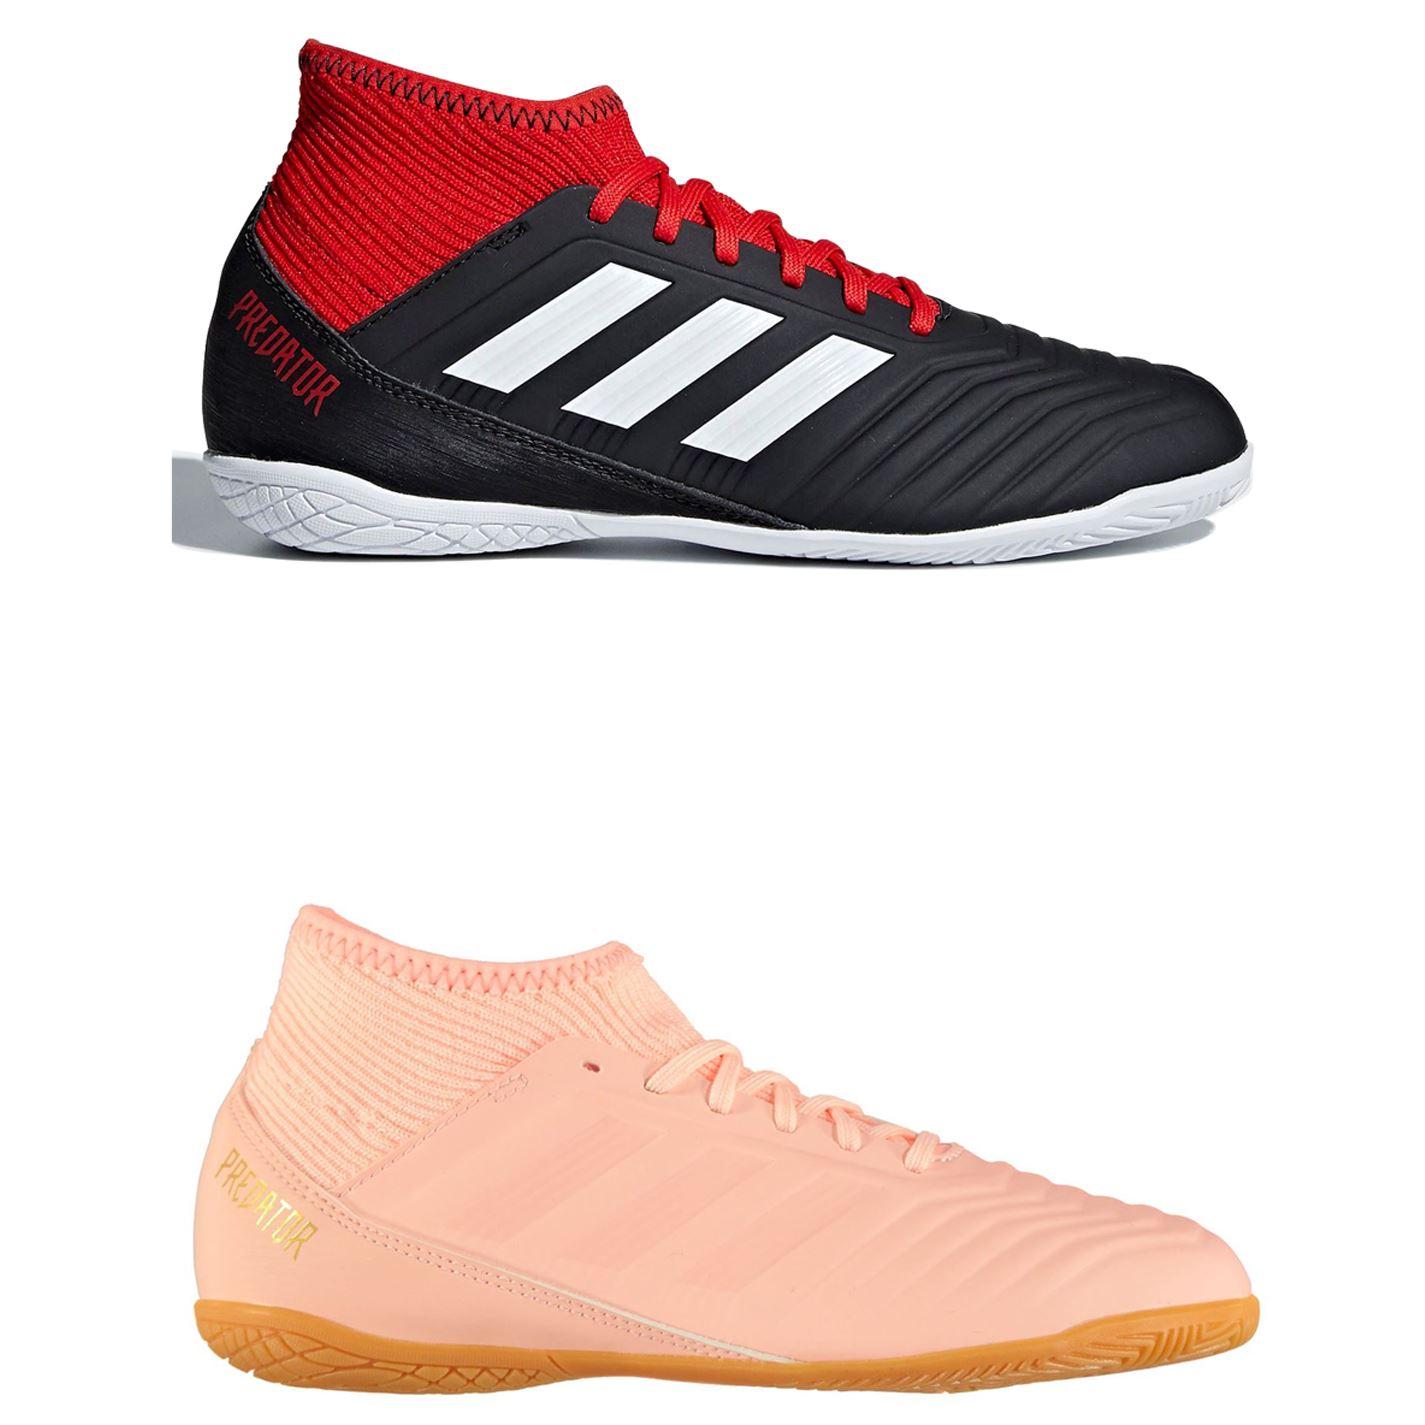 Dettagli su Adidas Predatore Tango 18.3 Indoor Calcio Scarpe Sportive Juniors Scarpe Calcio